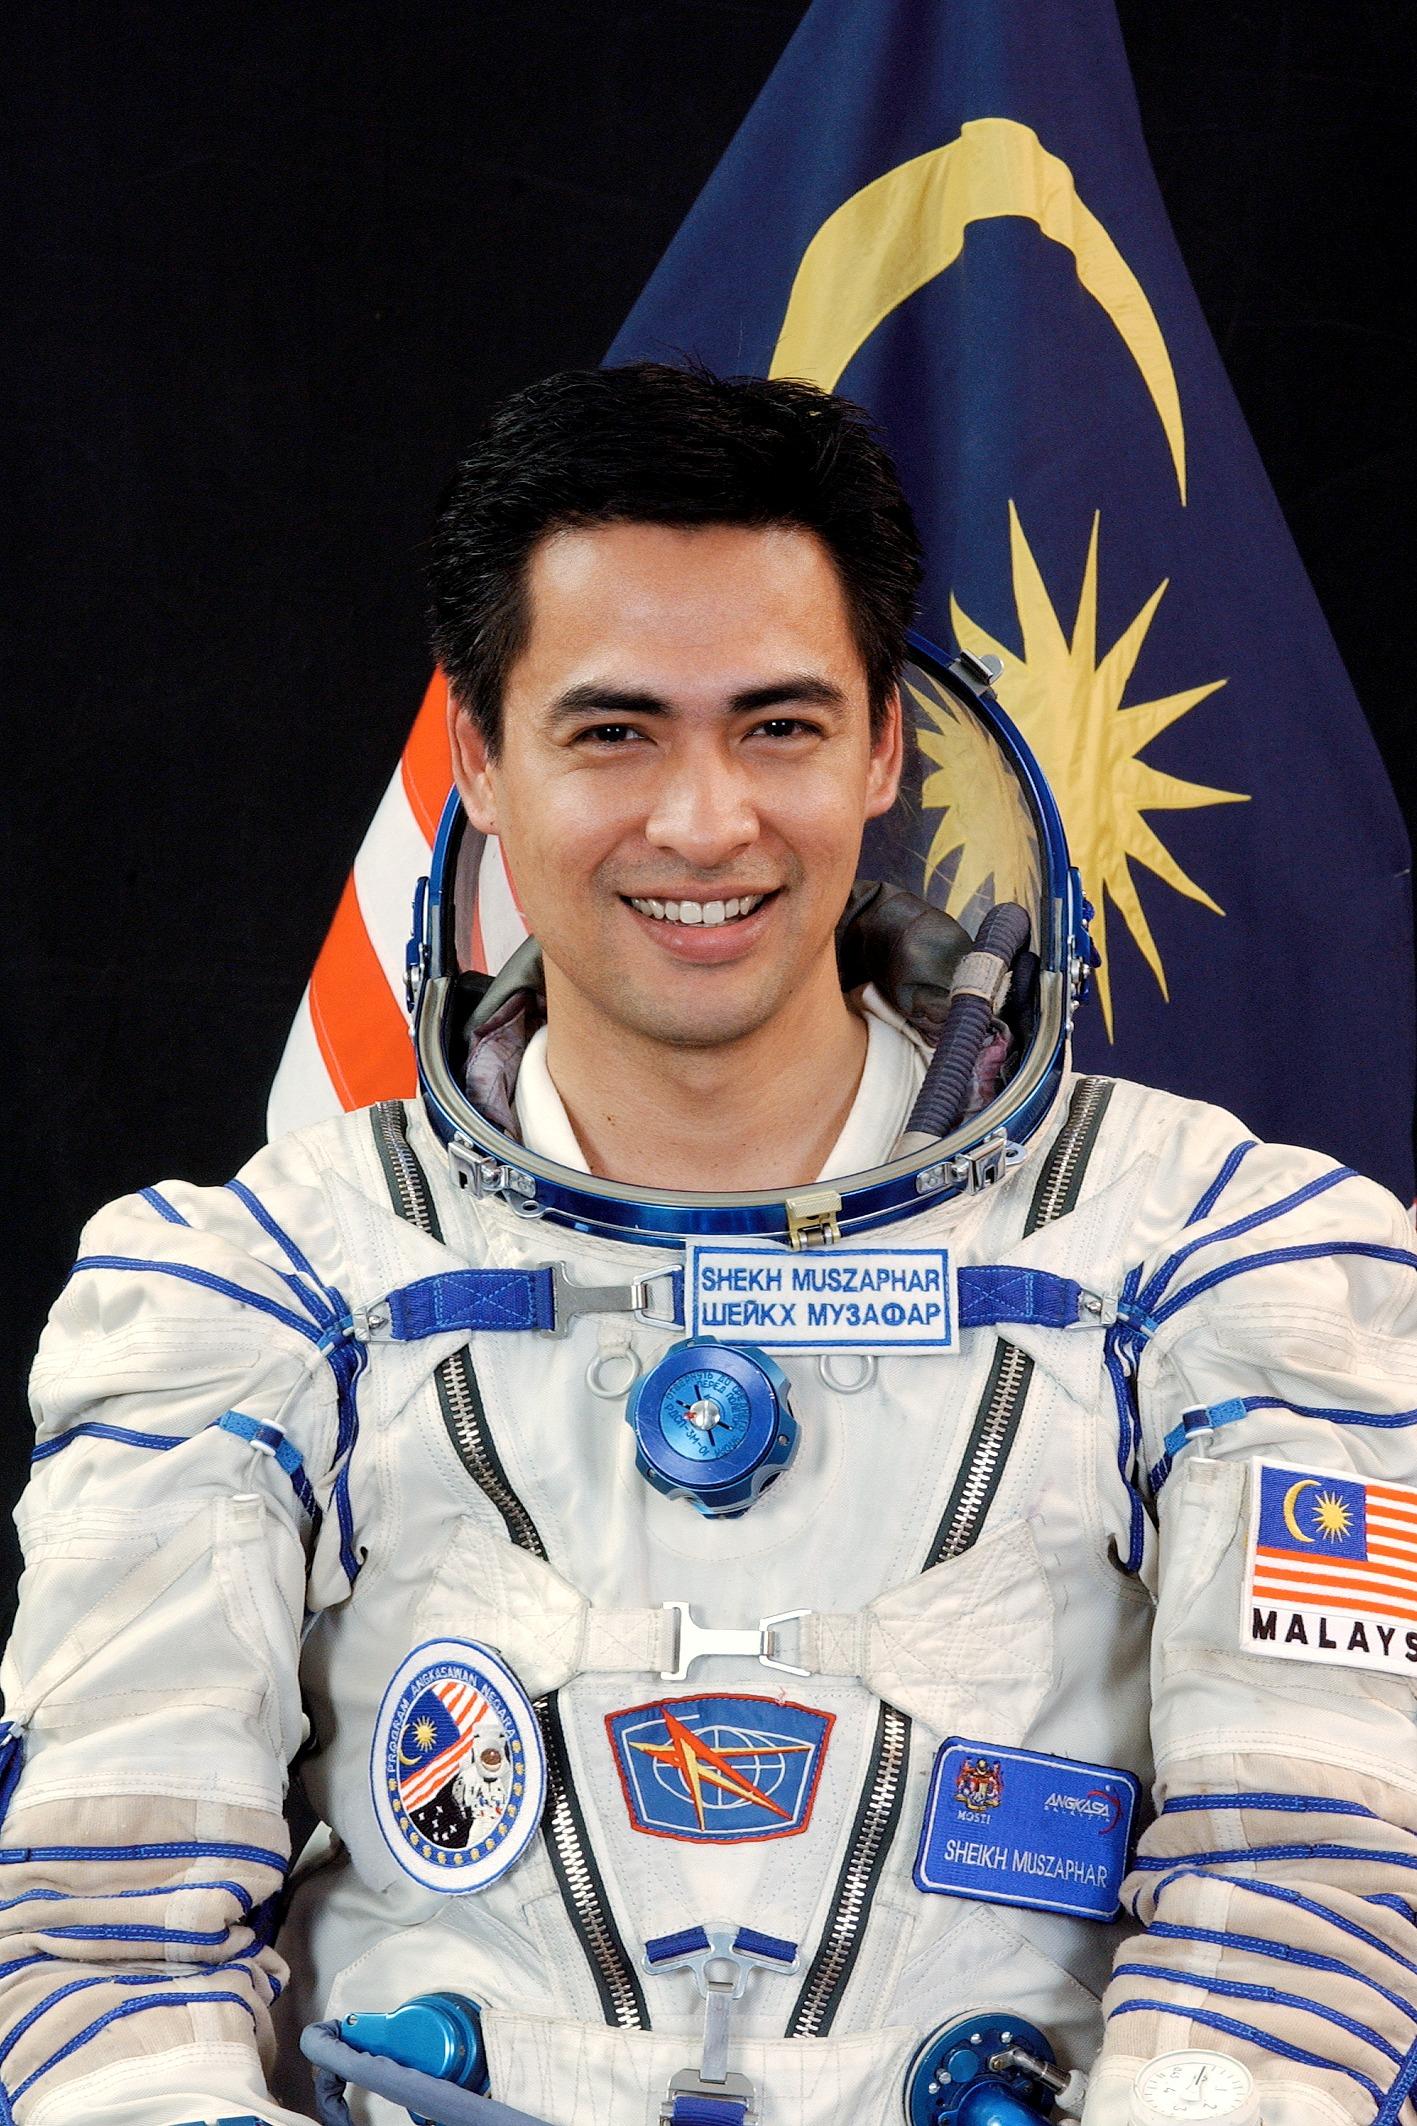 An astronaut generates the buzz.